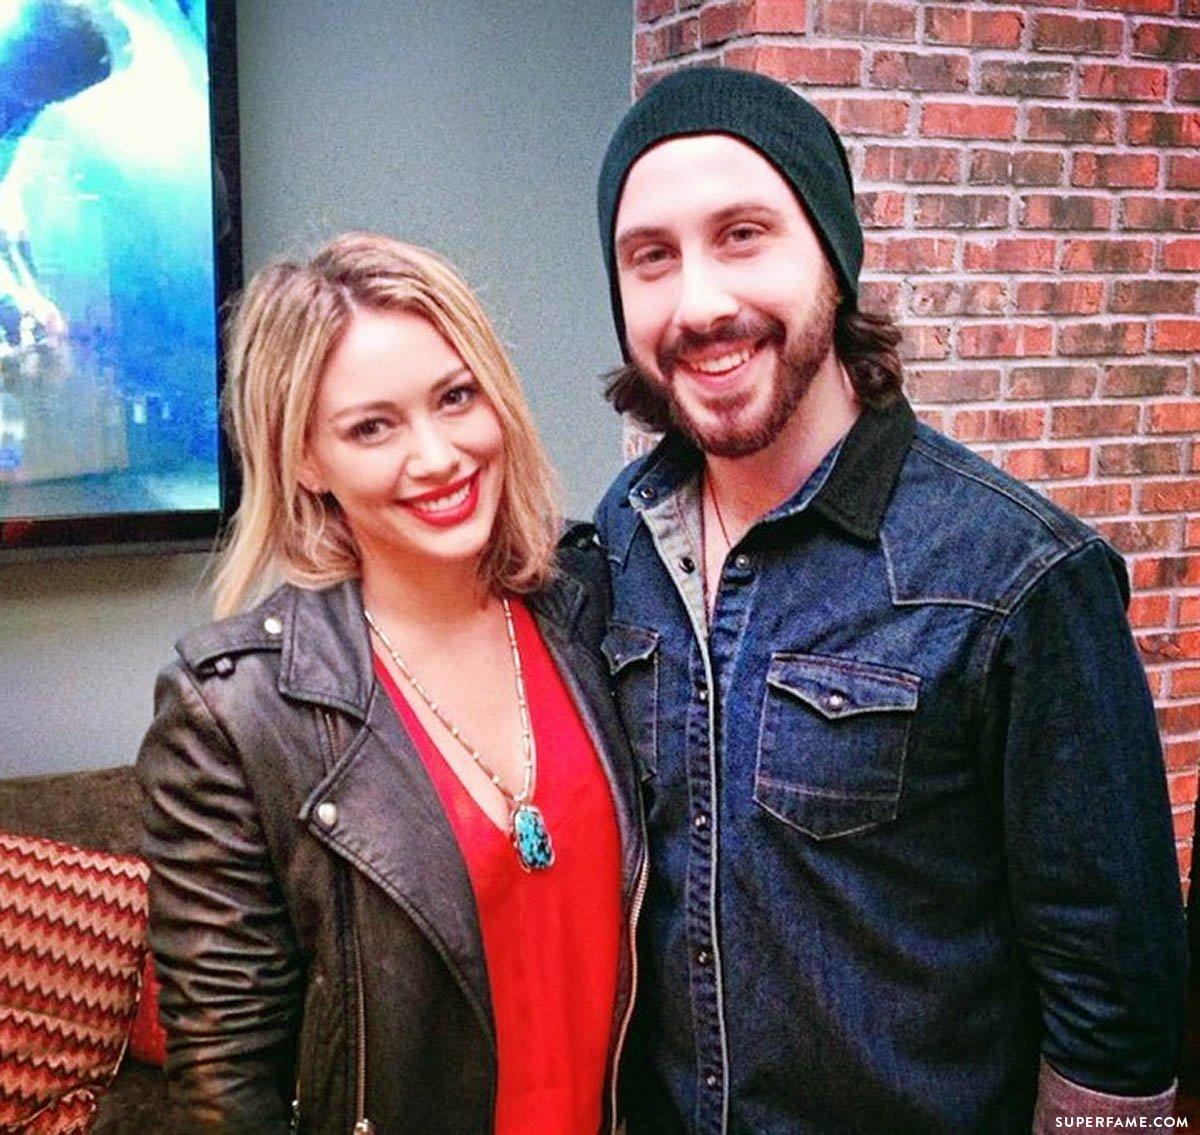 Avi Kaplan and Hilary Duff.